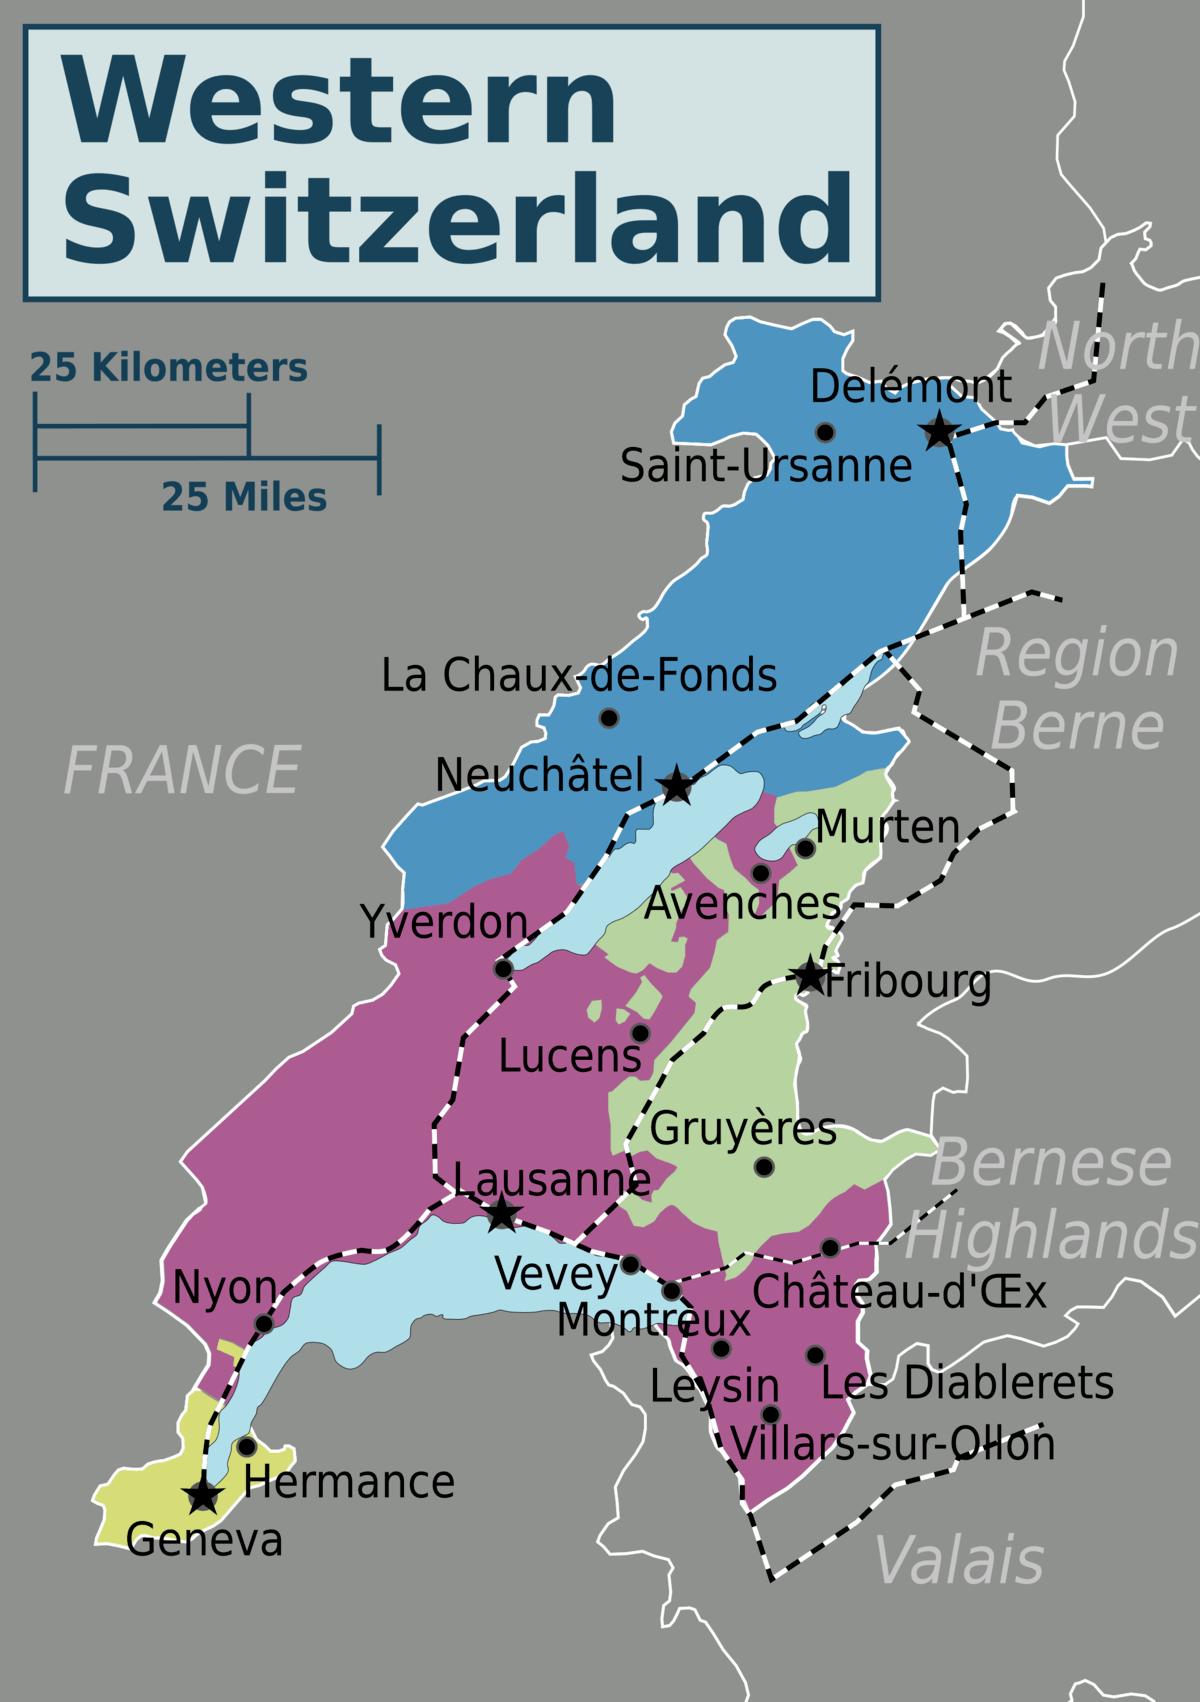 Western Switzerland Travel Guide At Wikivoyage